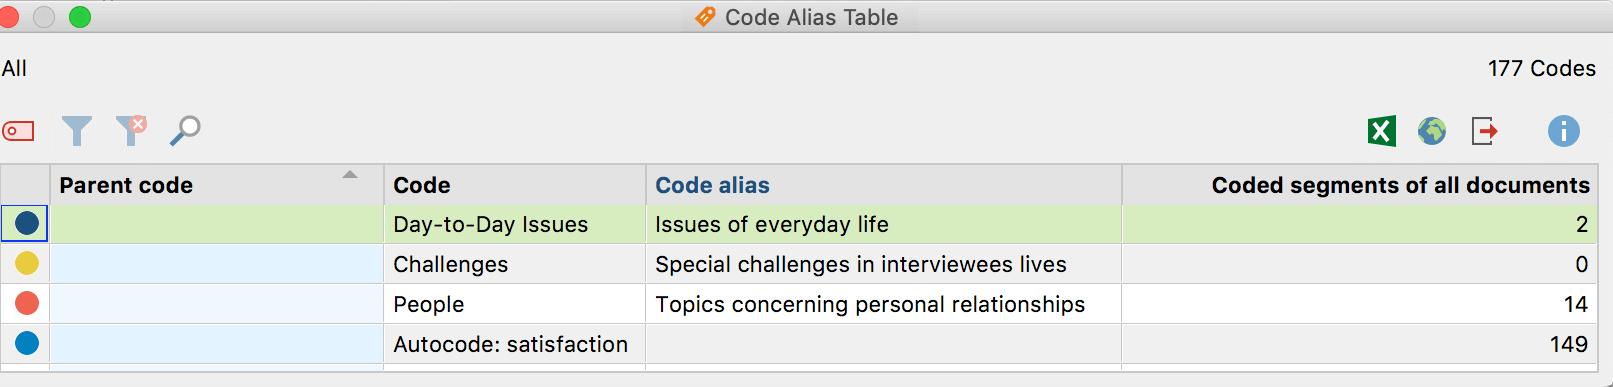 Code Alias Table